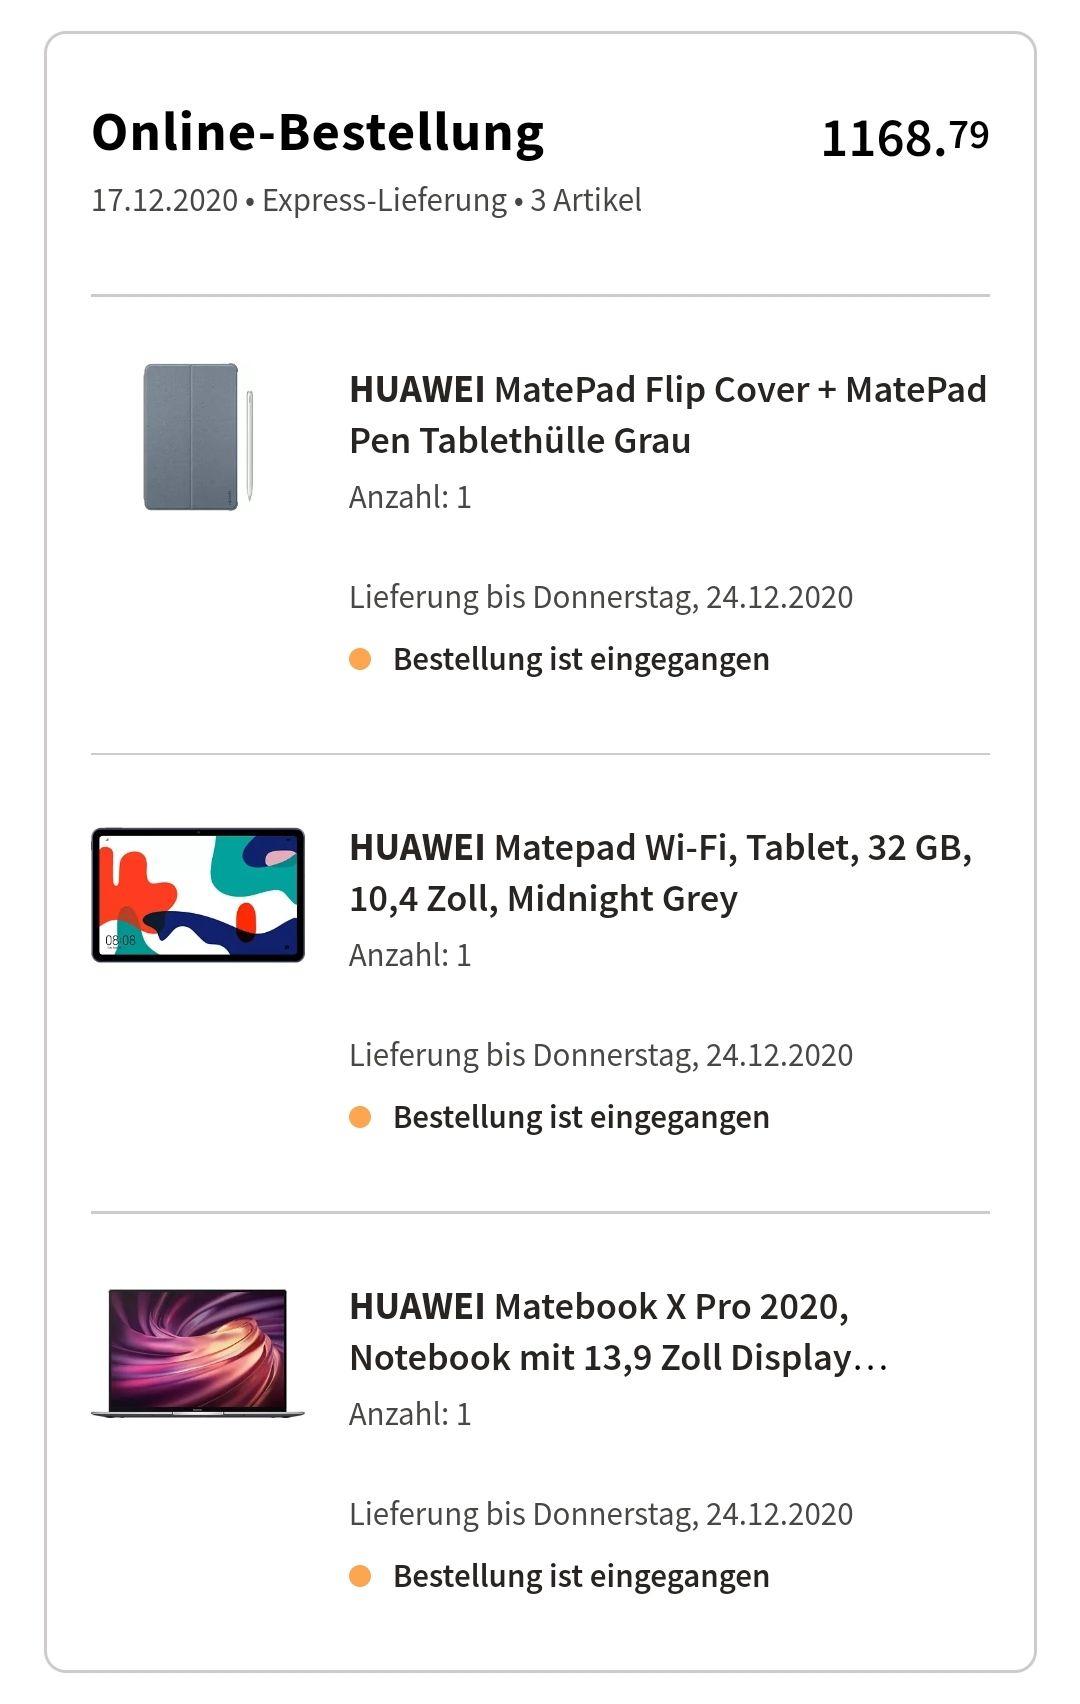 "Huawei Matebook X Pro 2020 13,9"" i5/16GB/512GB + Huawei Matepad Wi-Fi 32GB 10,4"" + FlipCover + Matepad Pen"